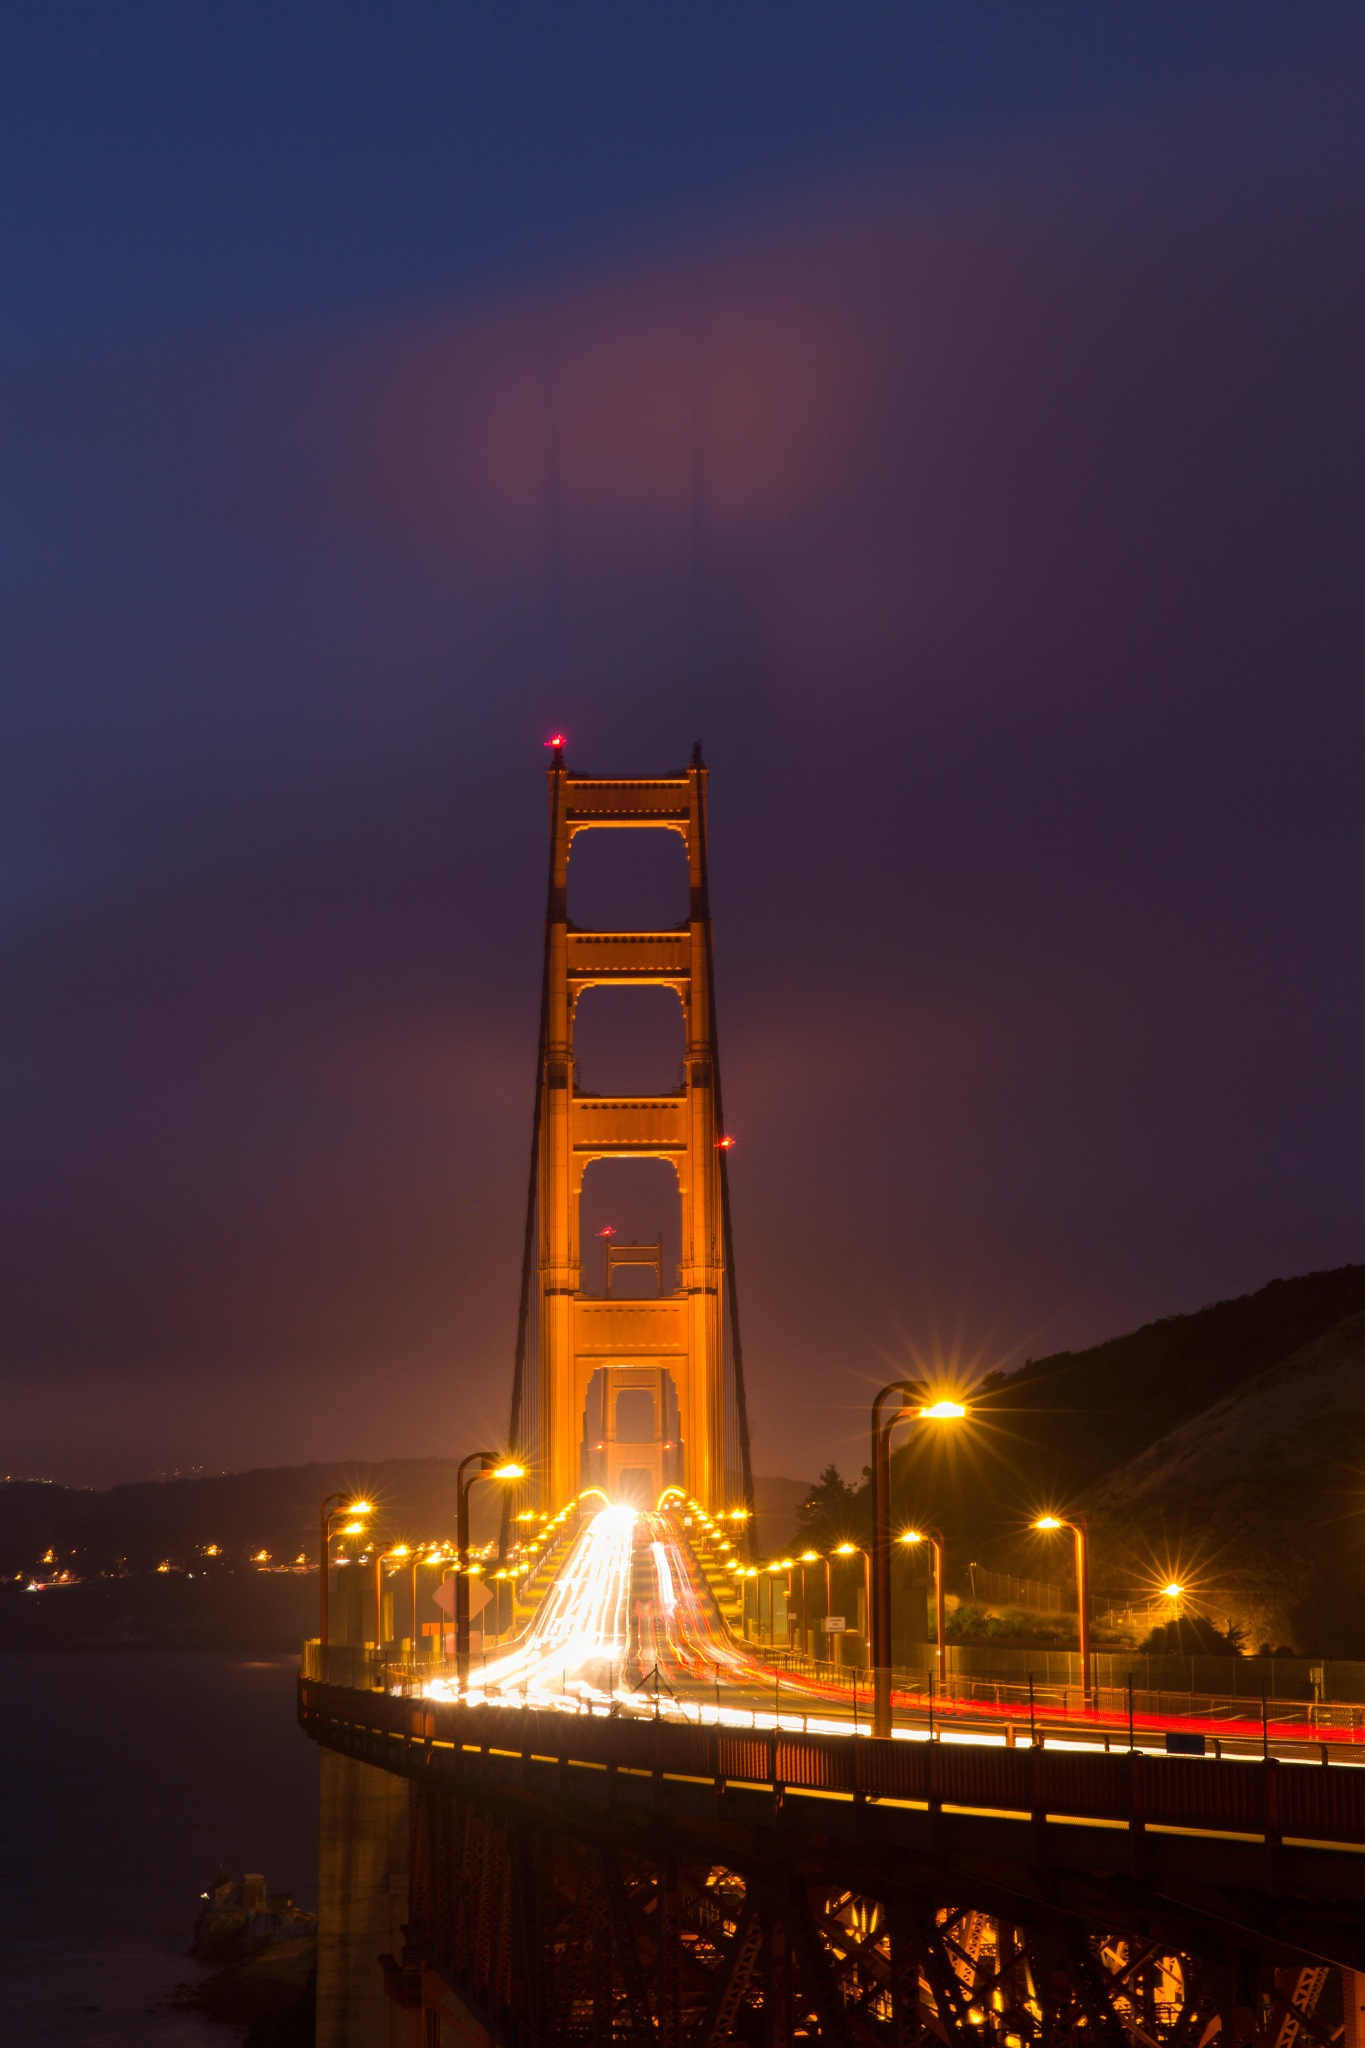 Twilight at Golden Gate Bridge by Dianachang